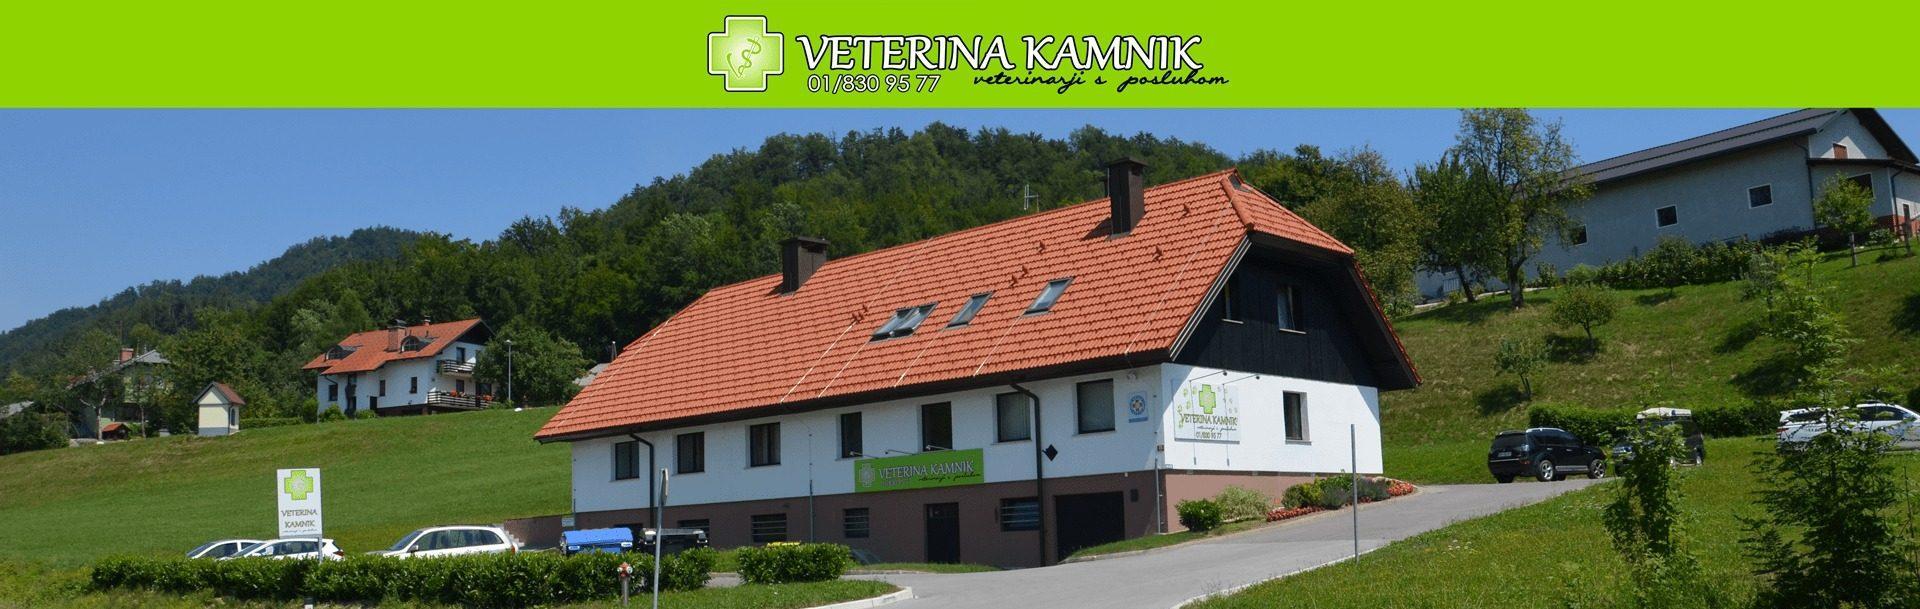 veterina-kamnik-baner-103